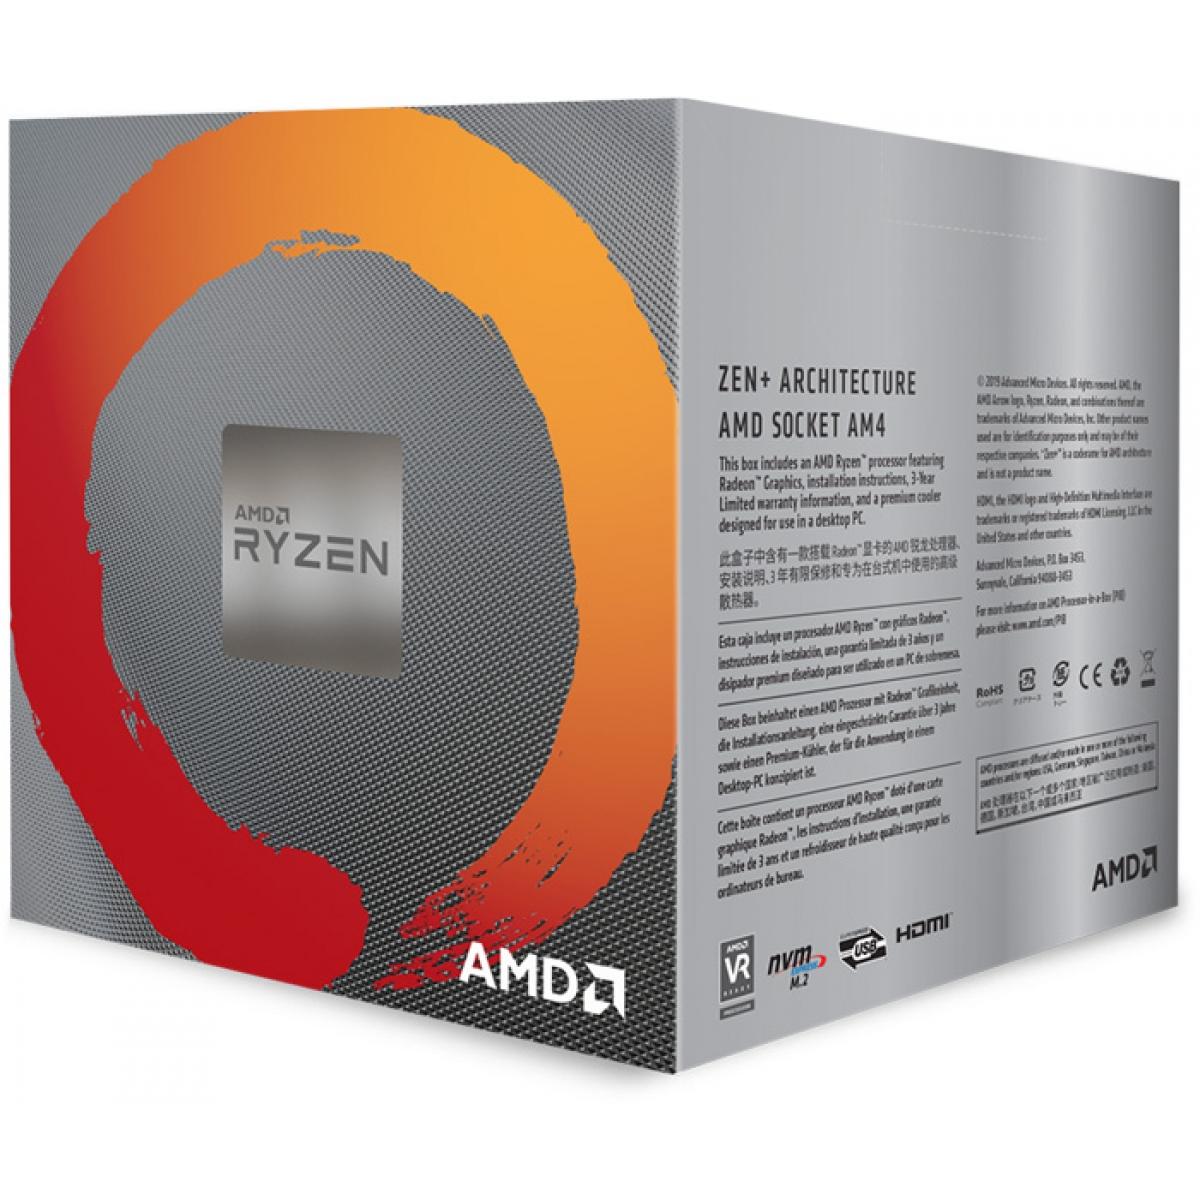 Processador AMD Ryzen 5 3400G 3.7GHz (4.2GHz Turbo), 4-Core 8-Thread, Cooler Wraith Stealth, AM4